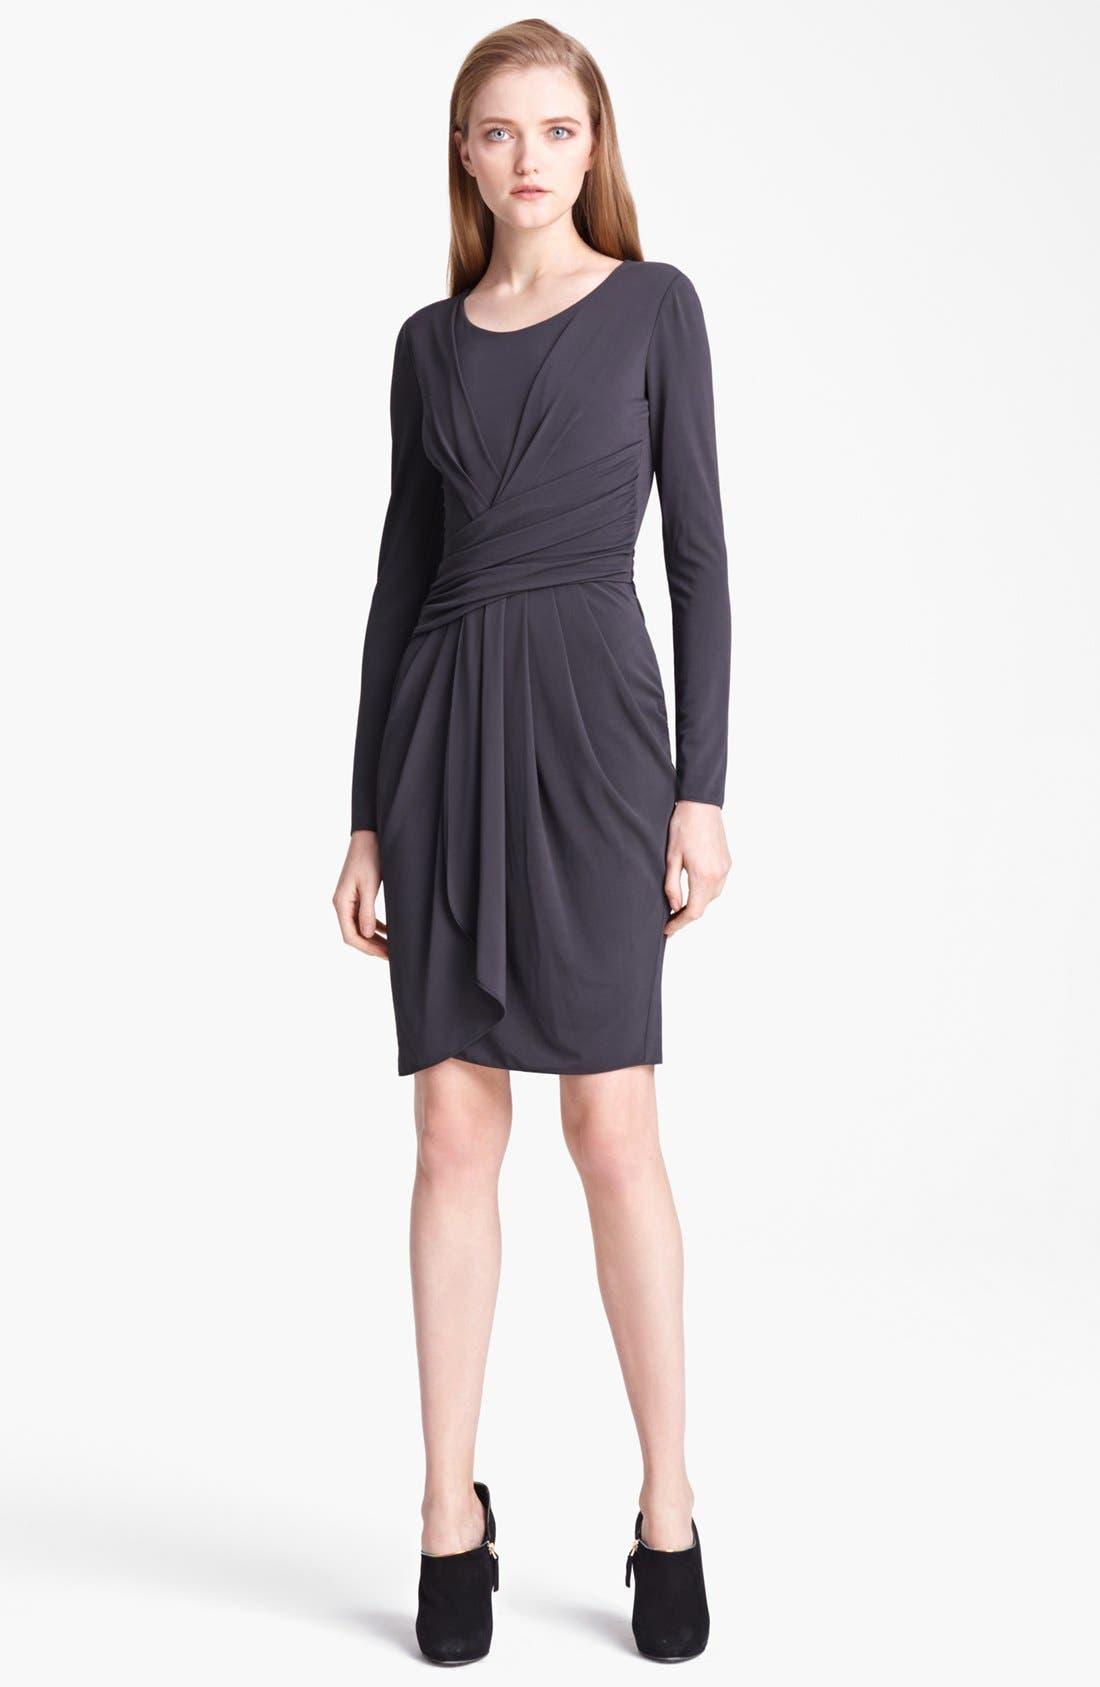 Alternate Image 1 Selected - Armani Collezioni Drape Front Jersey Dress